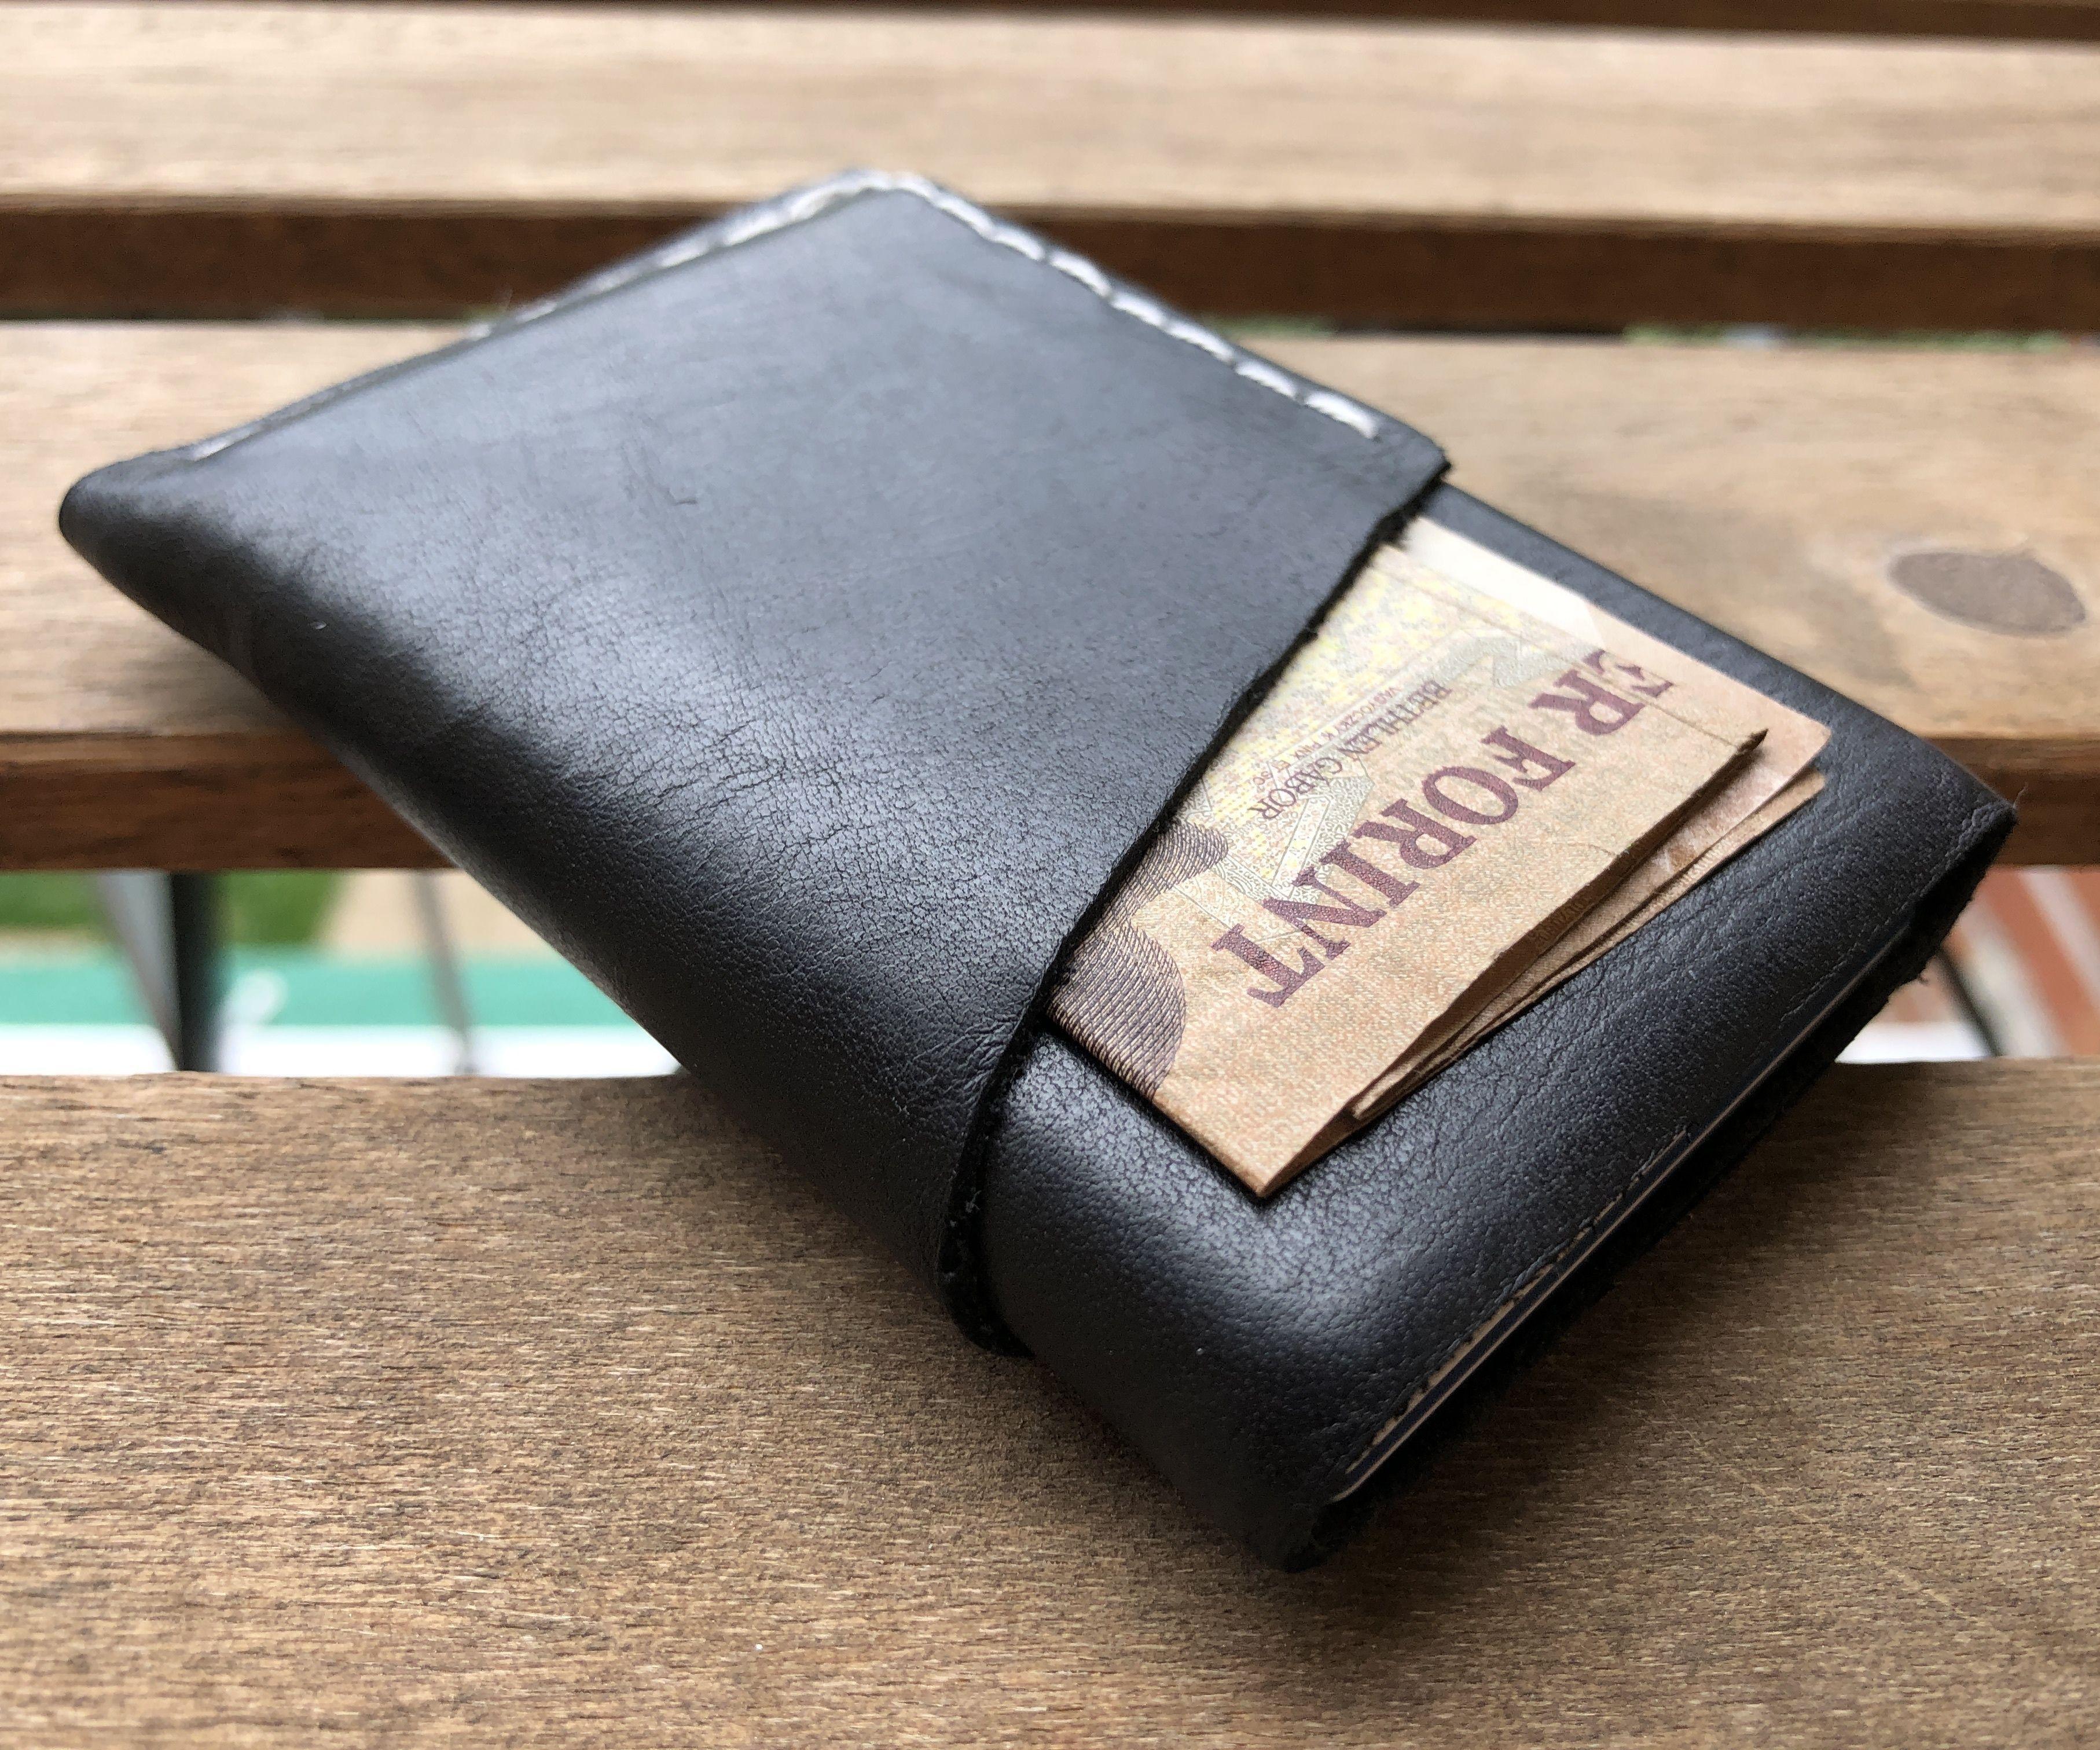 Slim EDC Leather Wallet - No Special Tools